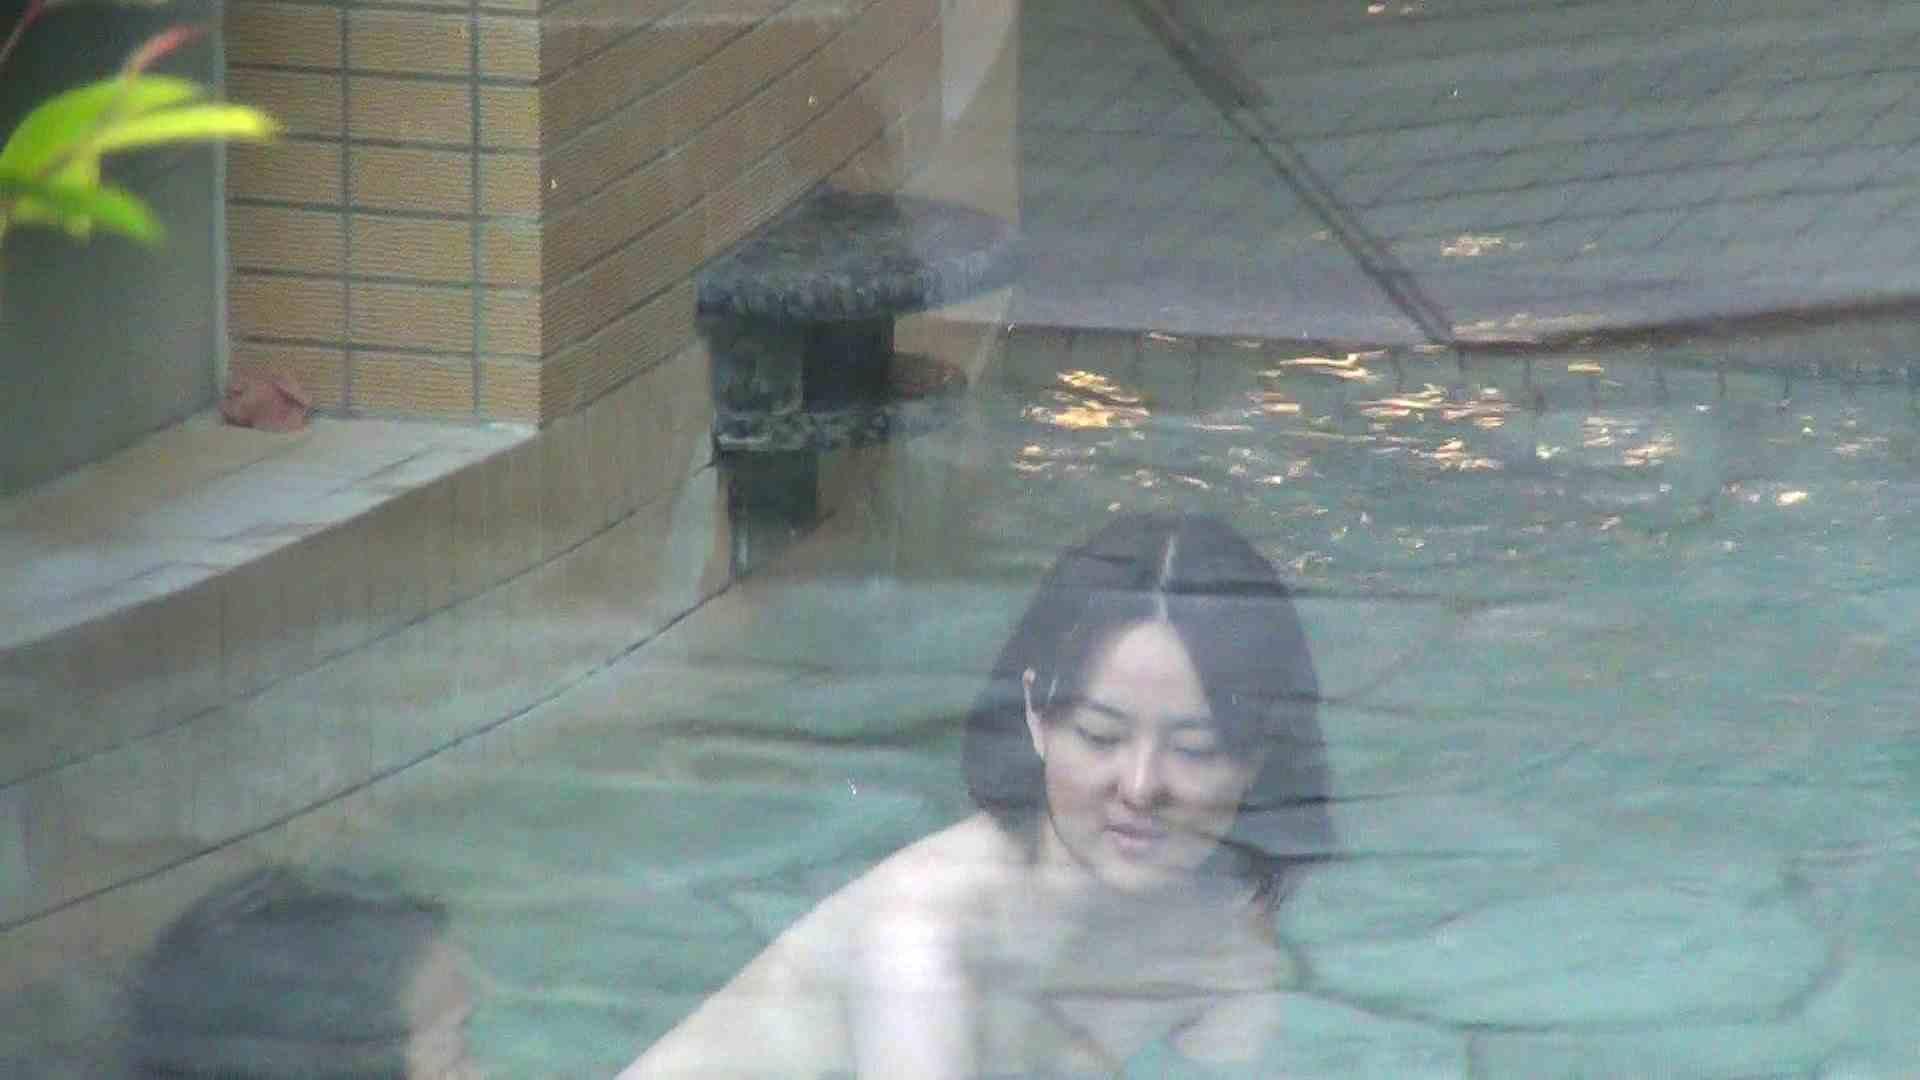 Aquaな露天風呂Vol.297 OLセックス 隠し撮りオマンコ動画紹介 103画像 80